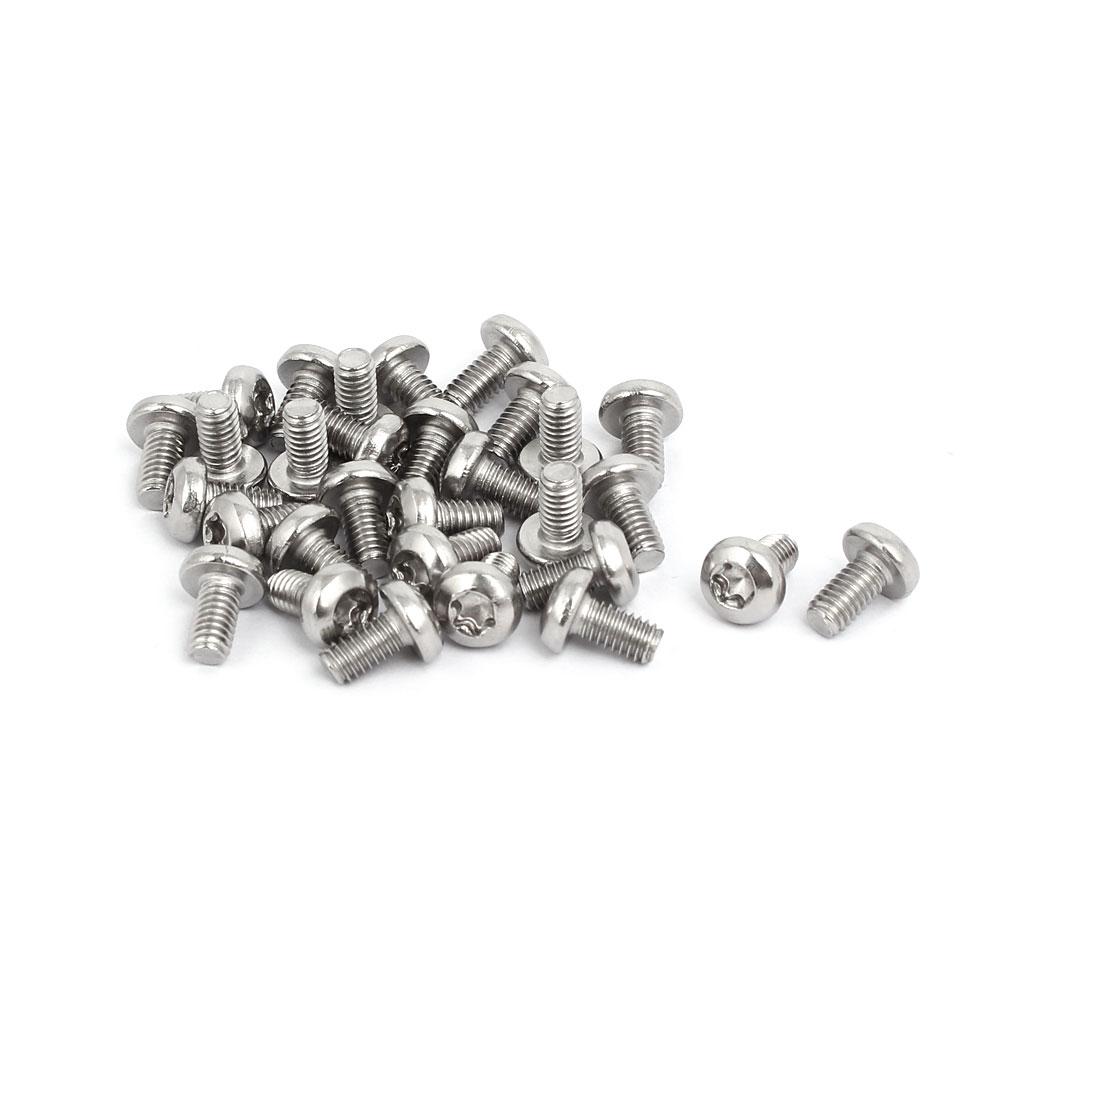 M4x8mm 304 Stainless Steel Button Head Torx Screws Bolts T10 Drive 30pcs